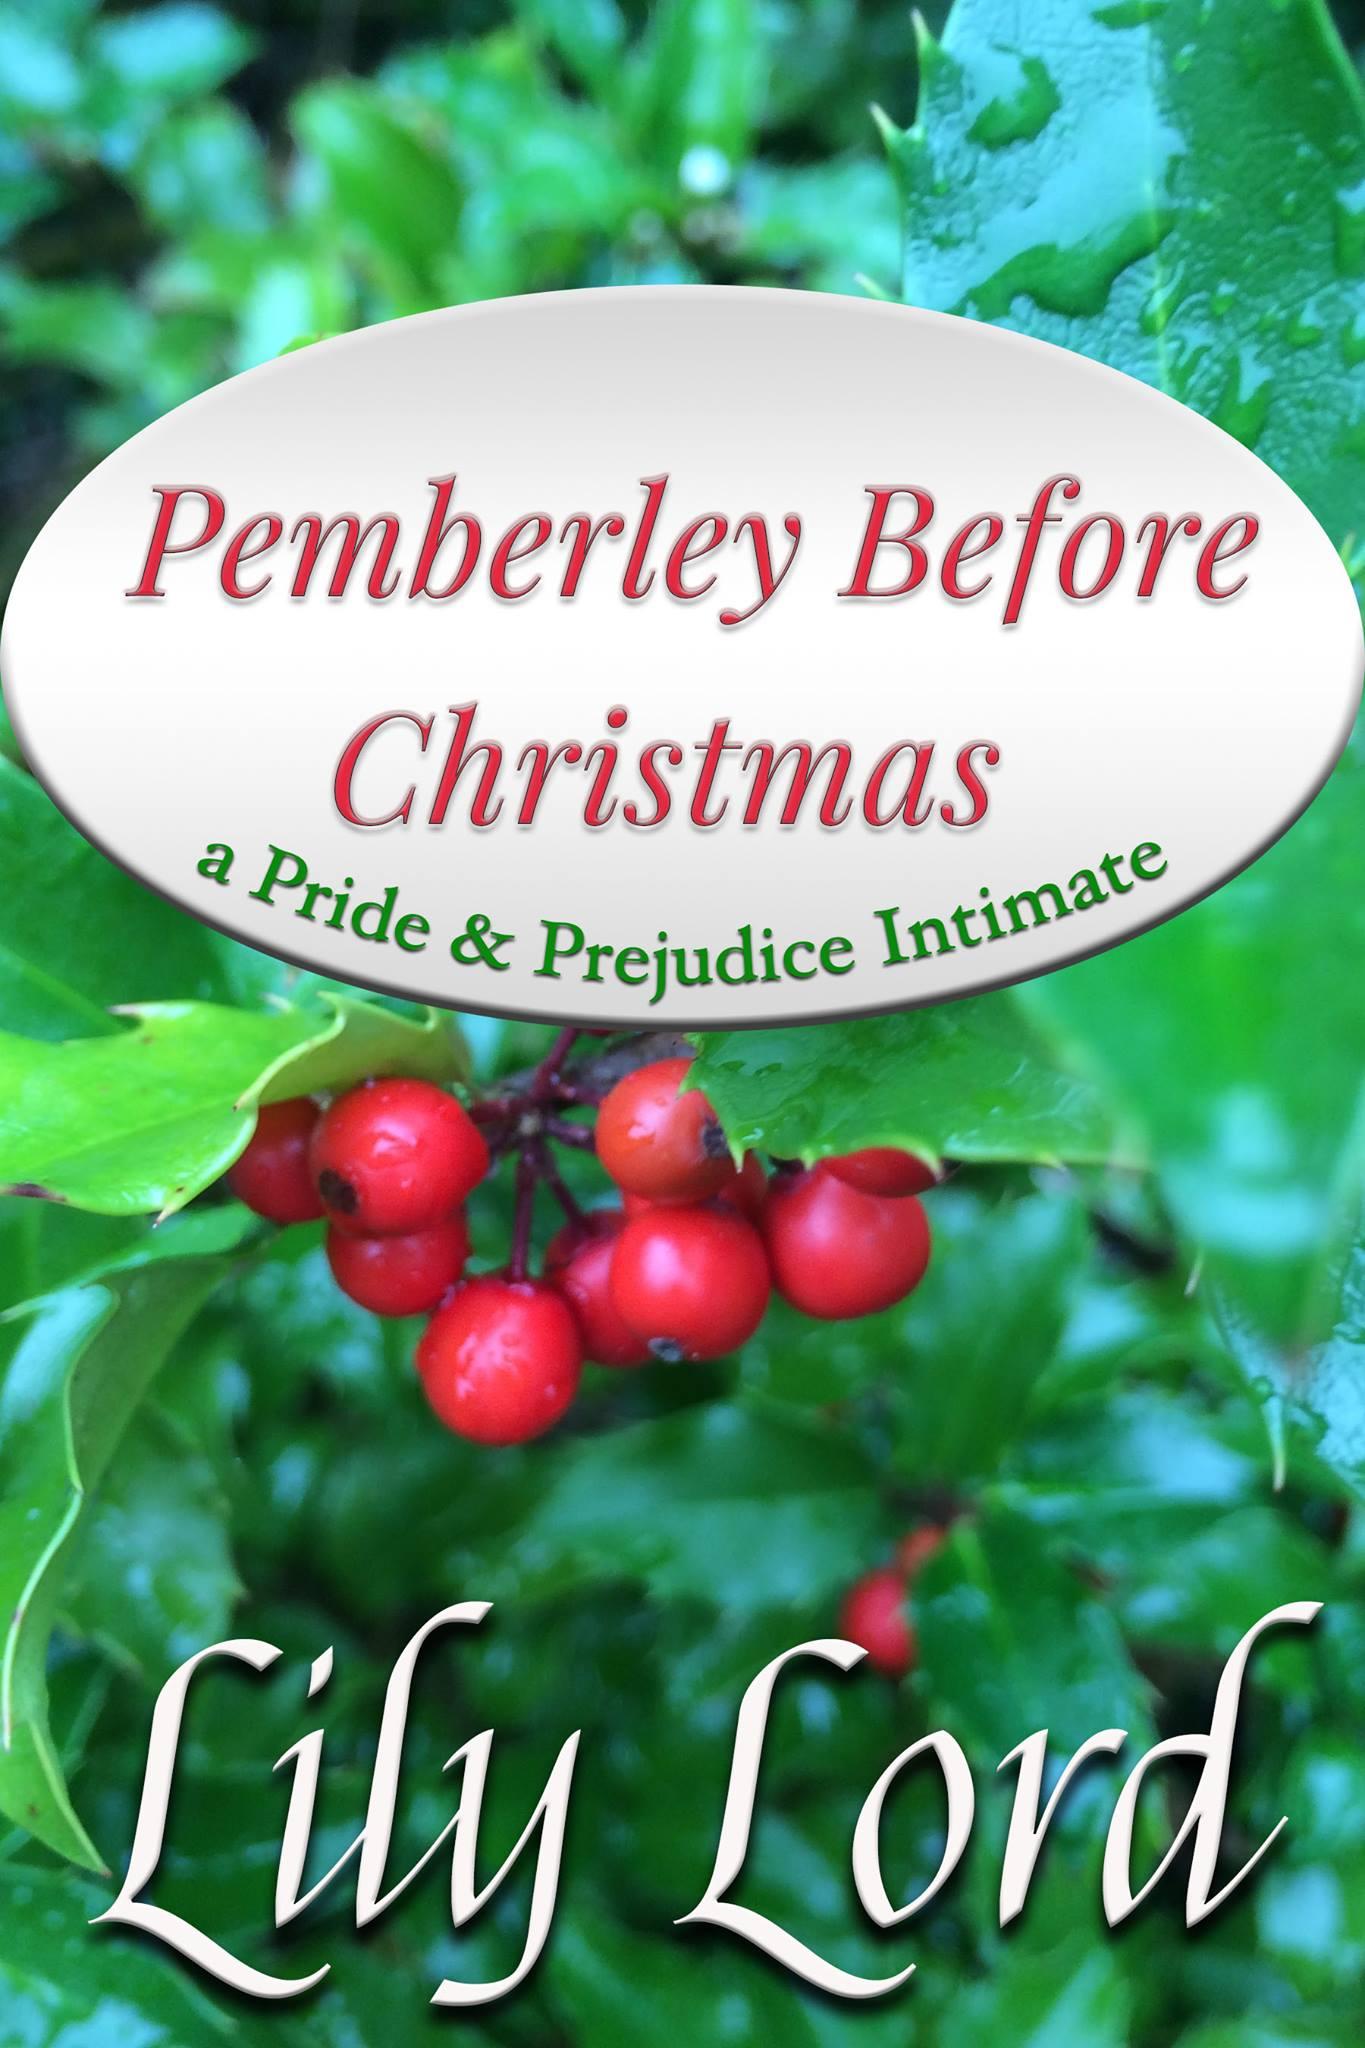 Pemberley Before Christmas Book Cover